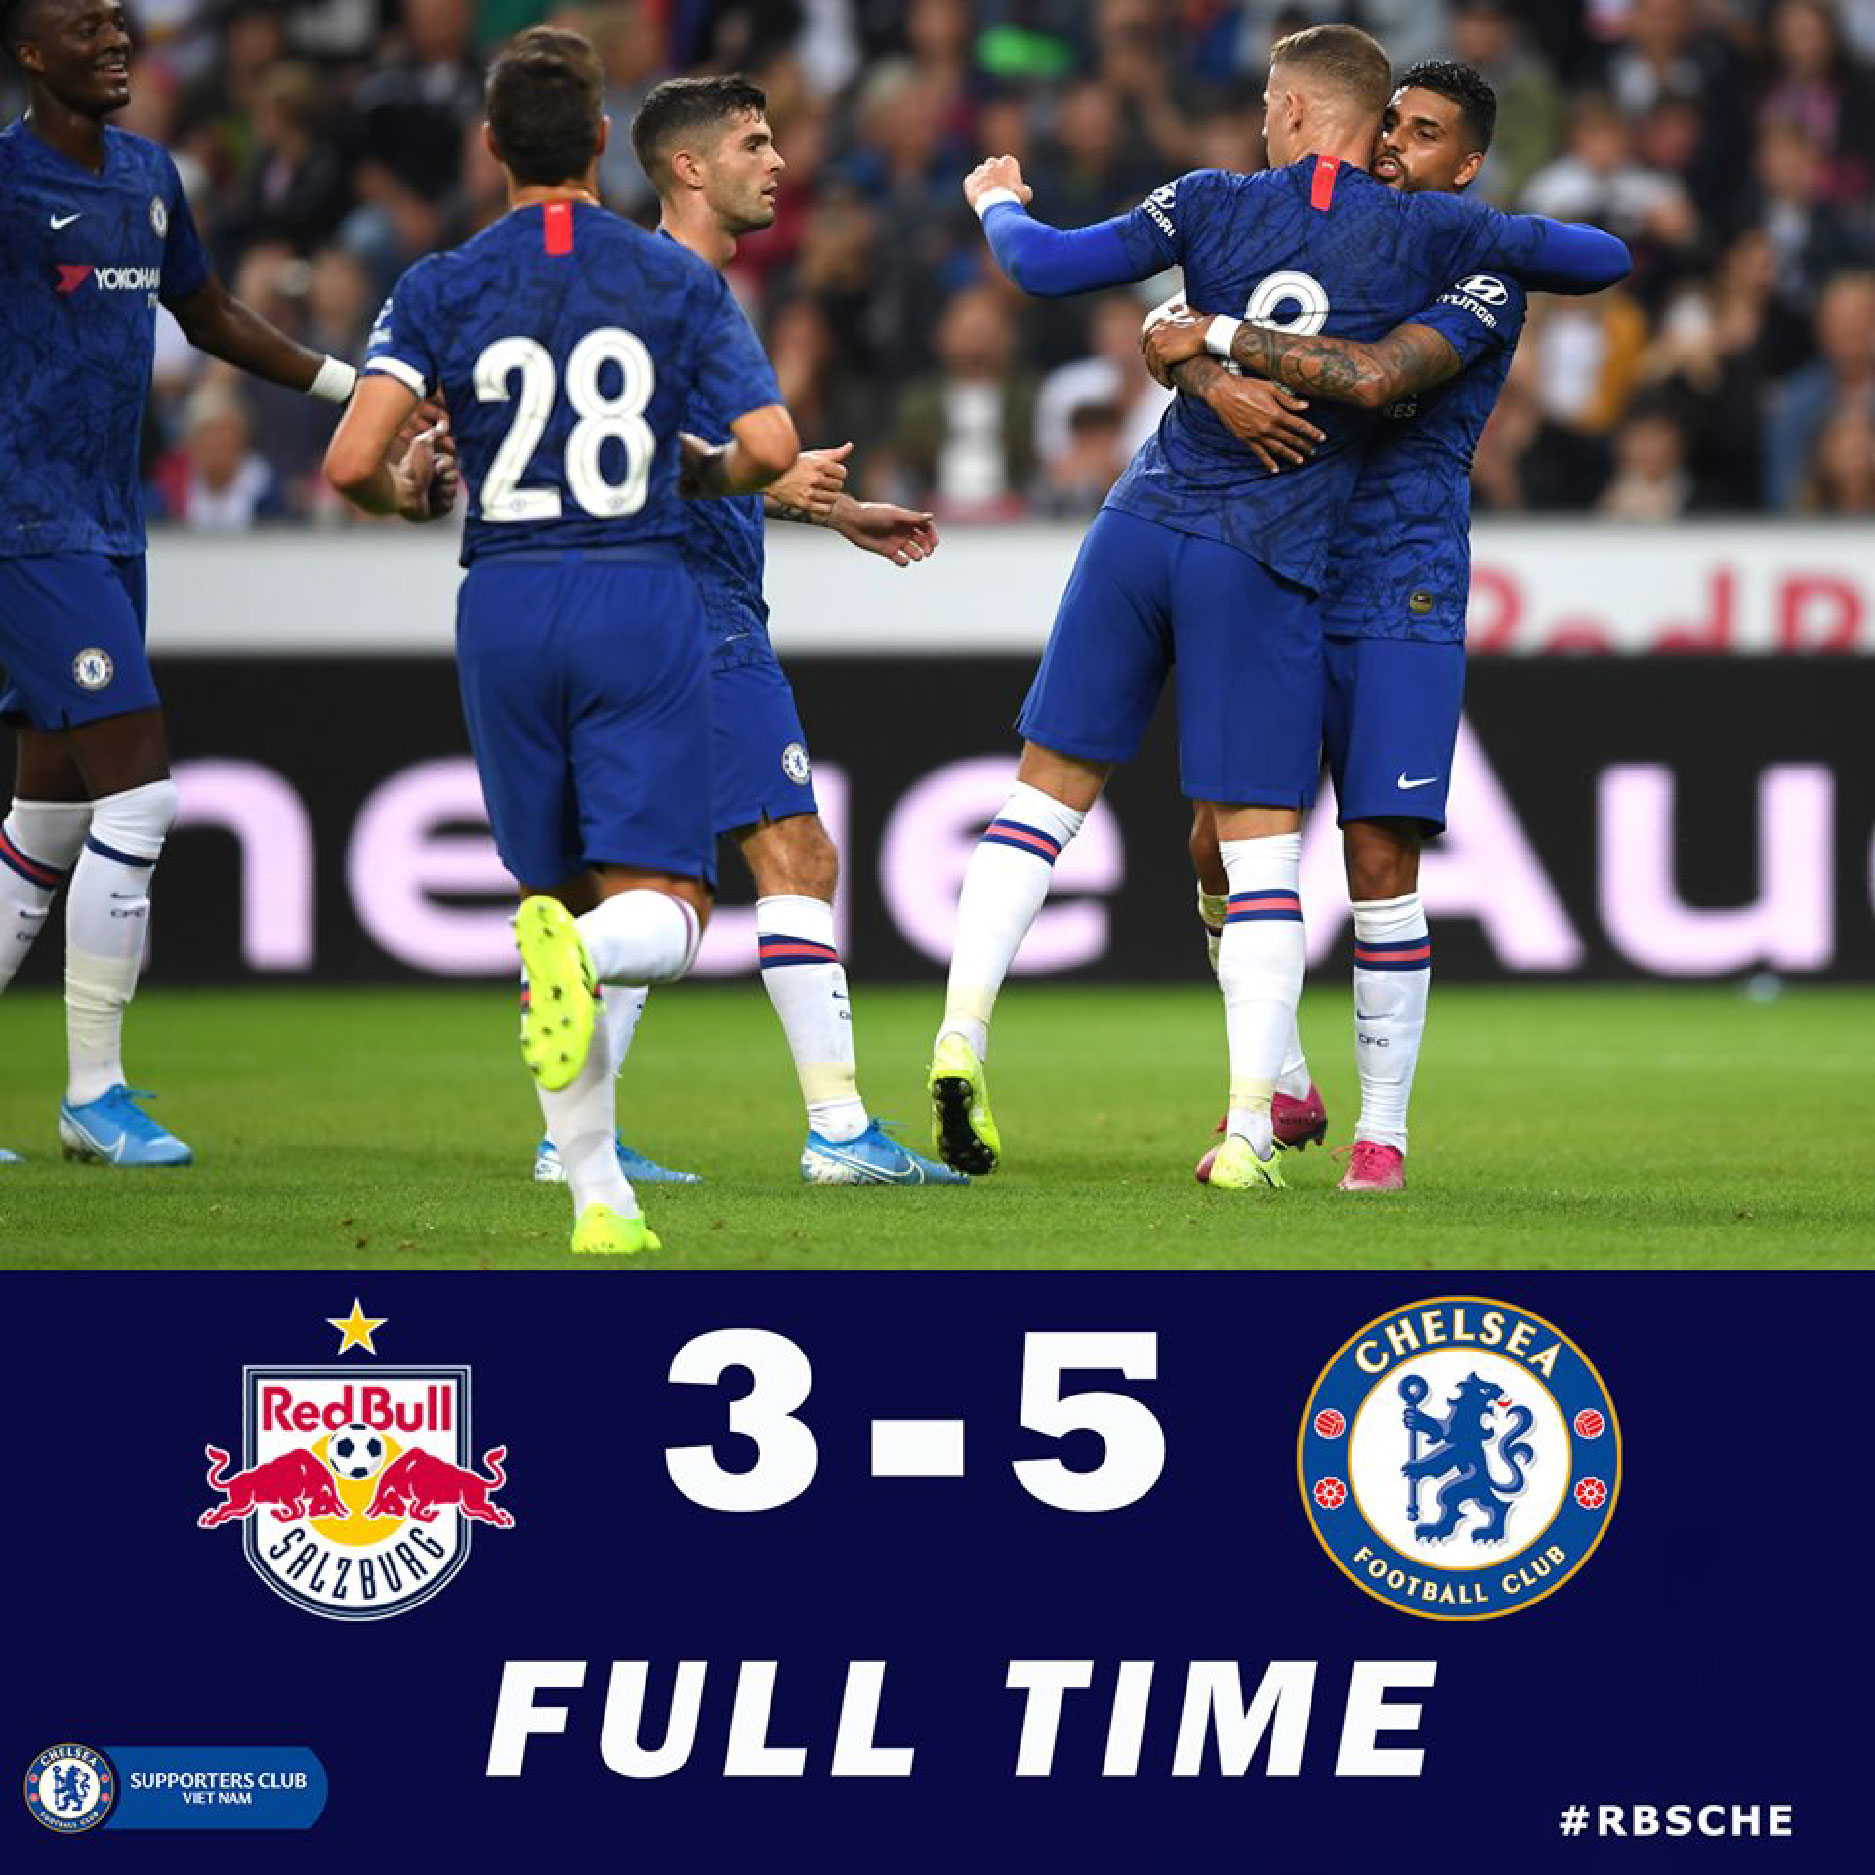 RB Salzburg 3-5 Chelsea: Tân binh Pulisic tỏa sáng